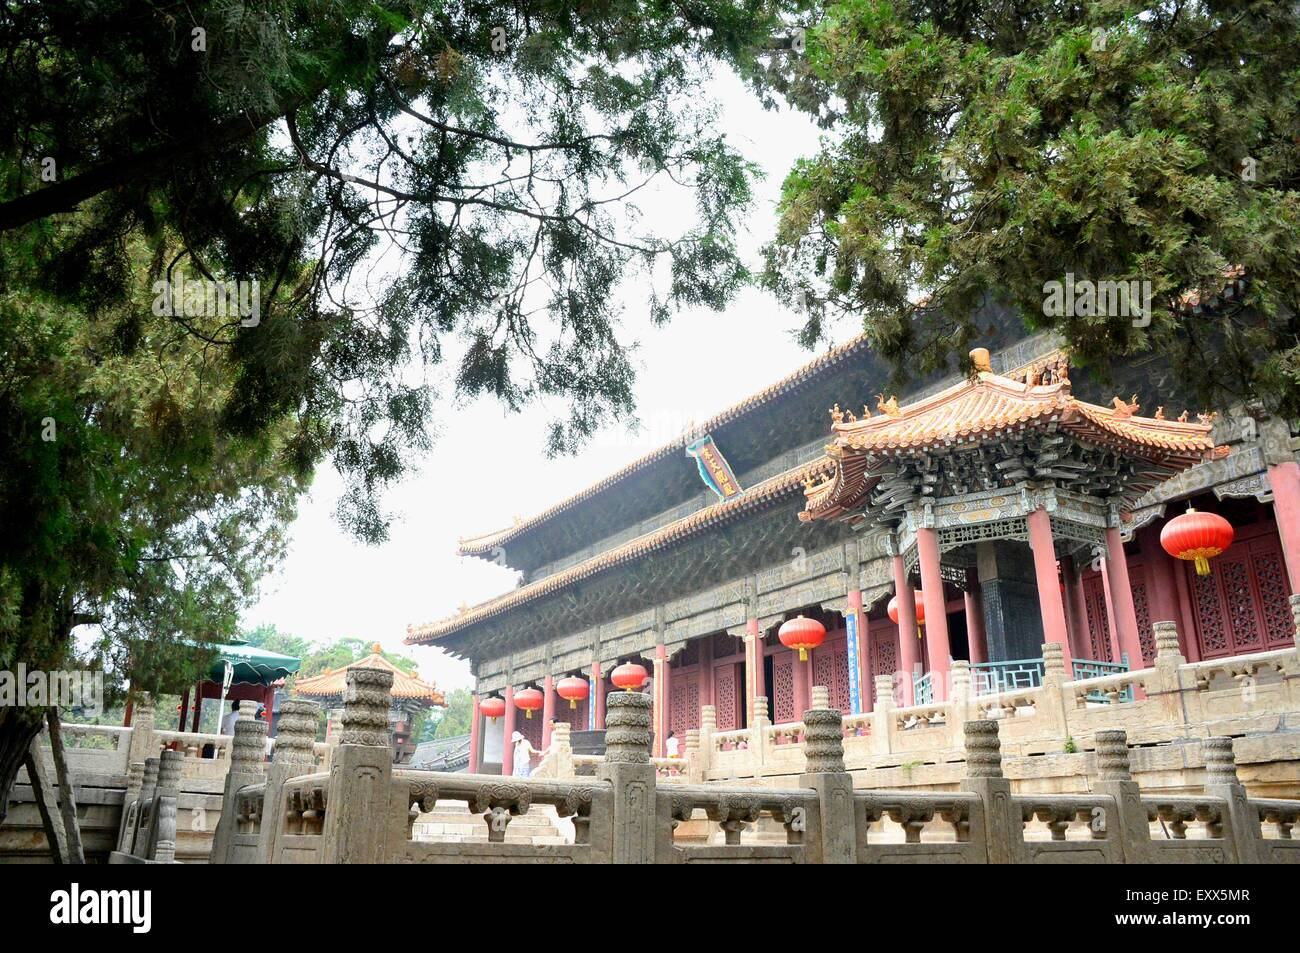 (150717) -- TAI'AN , July. 17, 2015 (Xinhua) --  Tourists appreciate Tiankuang Hall, the main structure of Dai - Stock Image